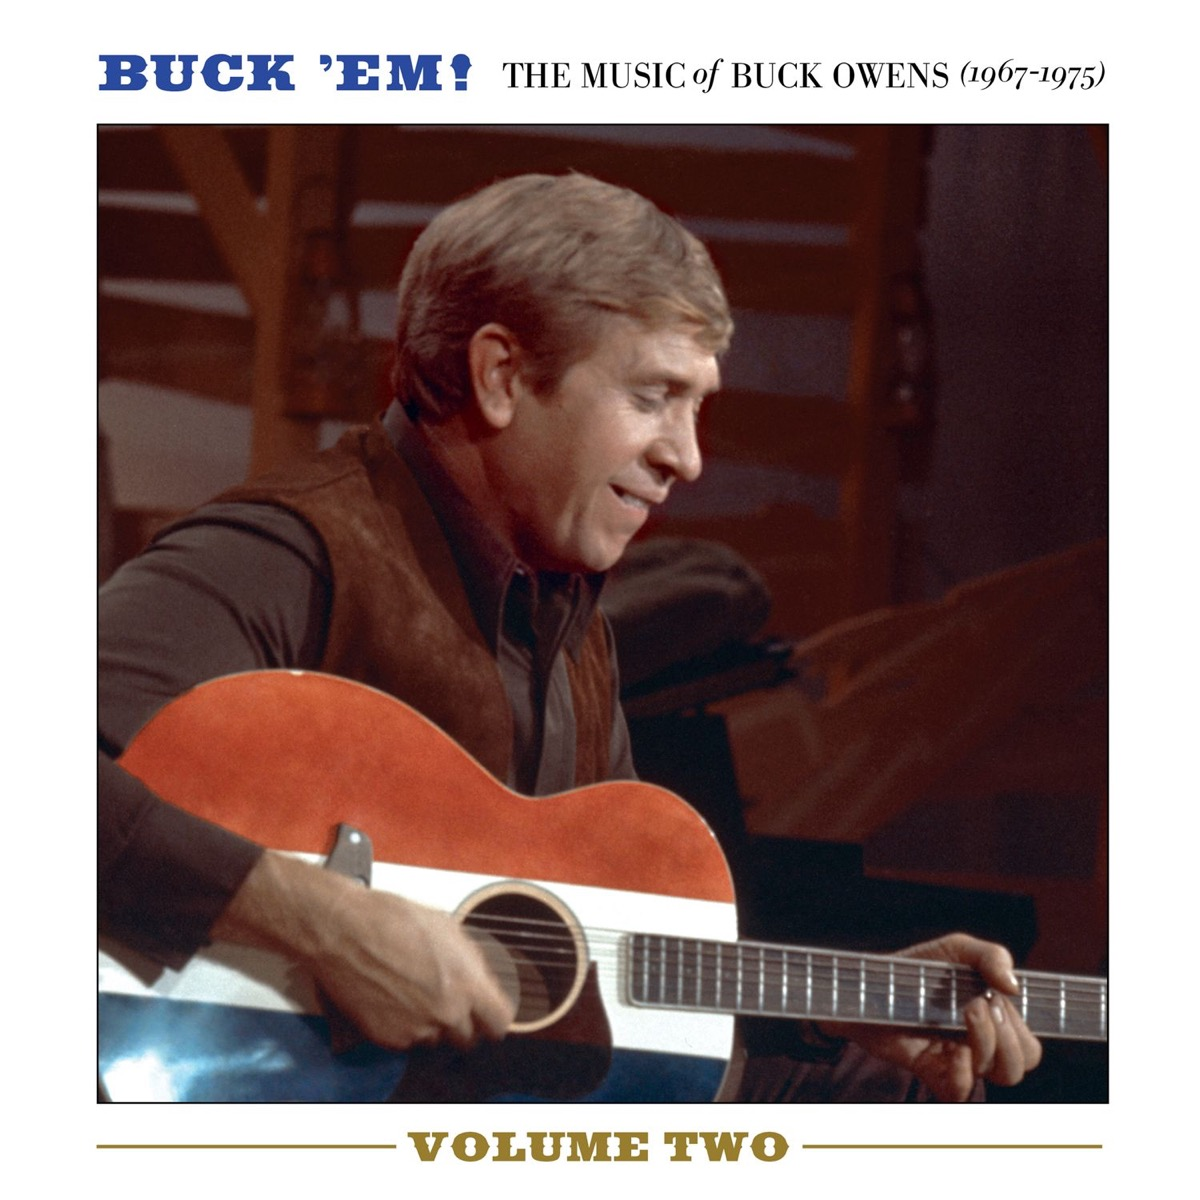 buck owens バック オウエンズ の情報まとめ okmusic 全ての音楽